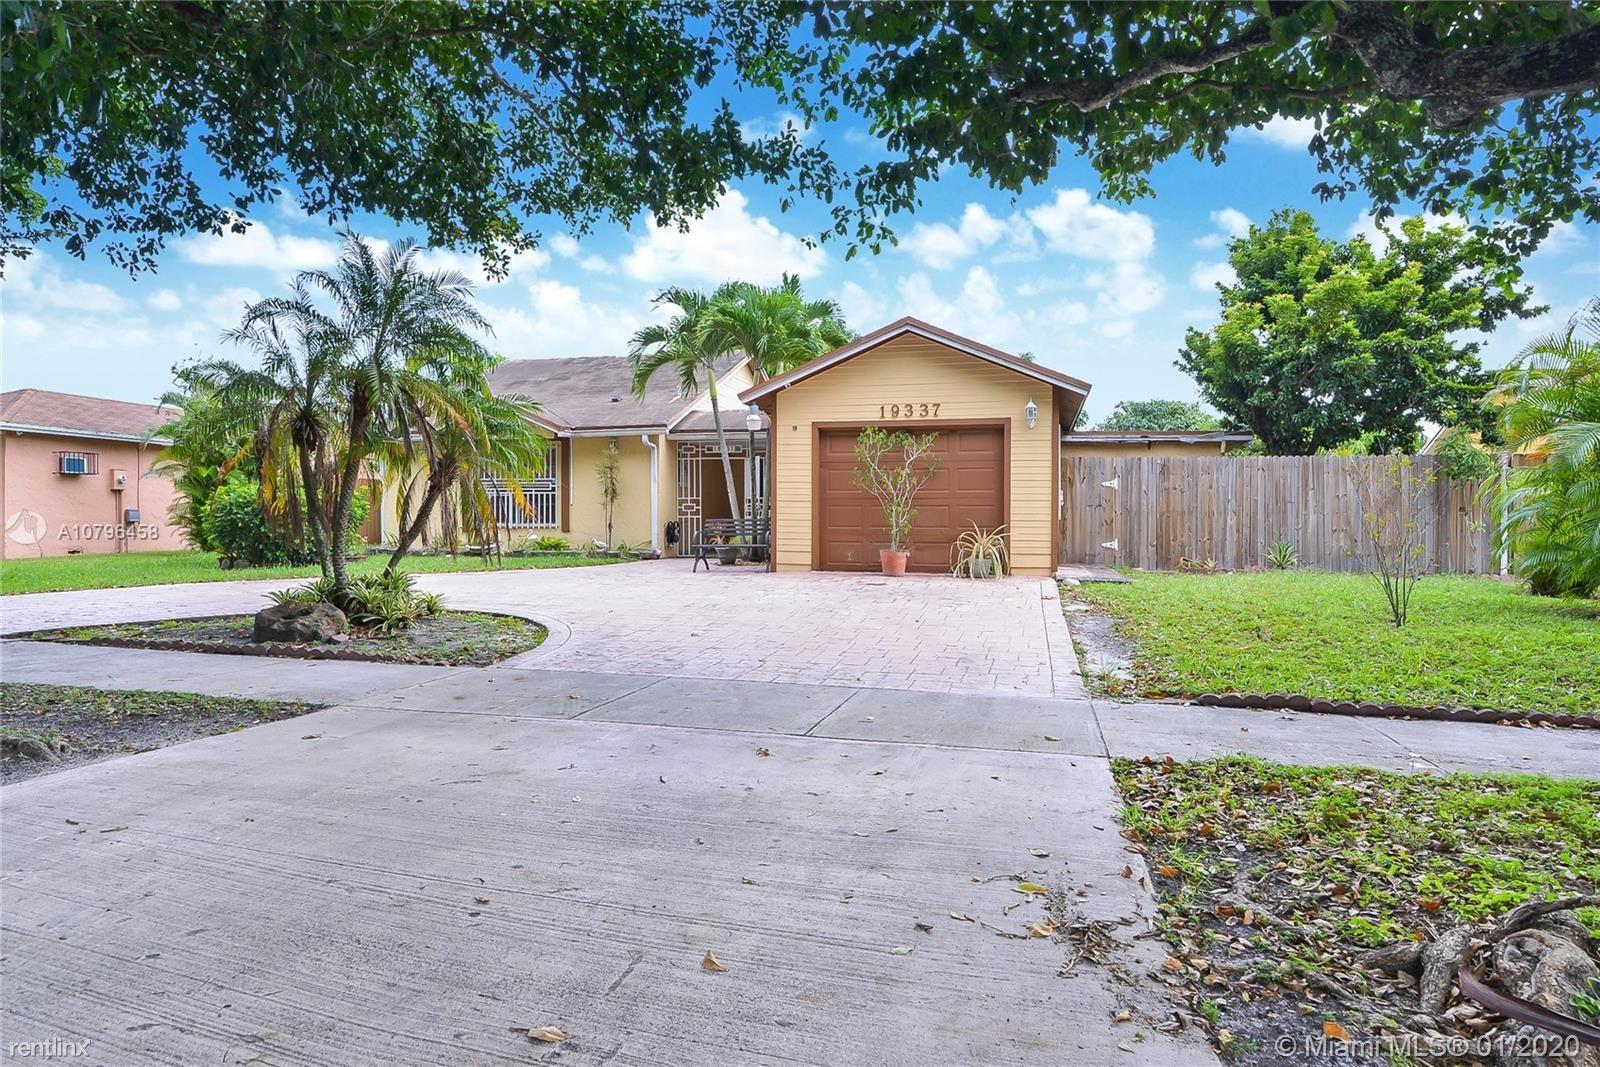 19337 NW 62nd Ave, Hialeah, FL - $2,500